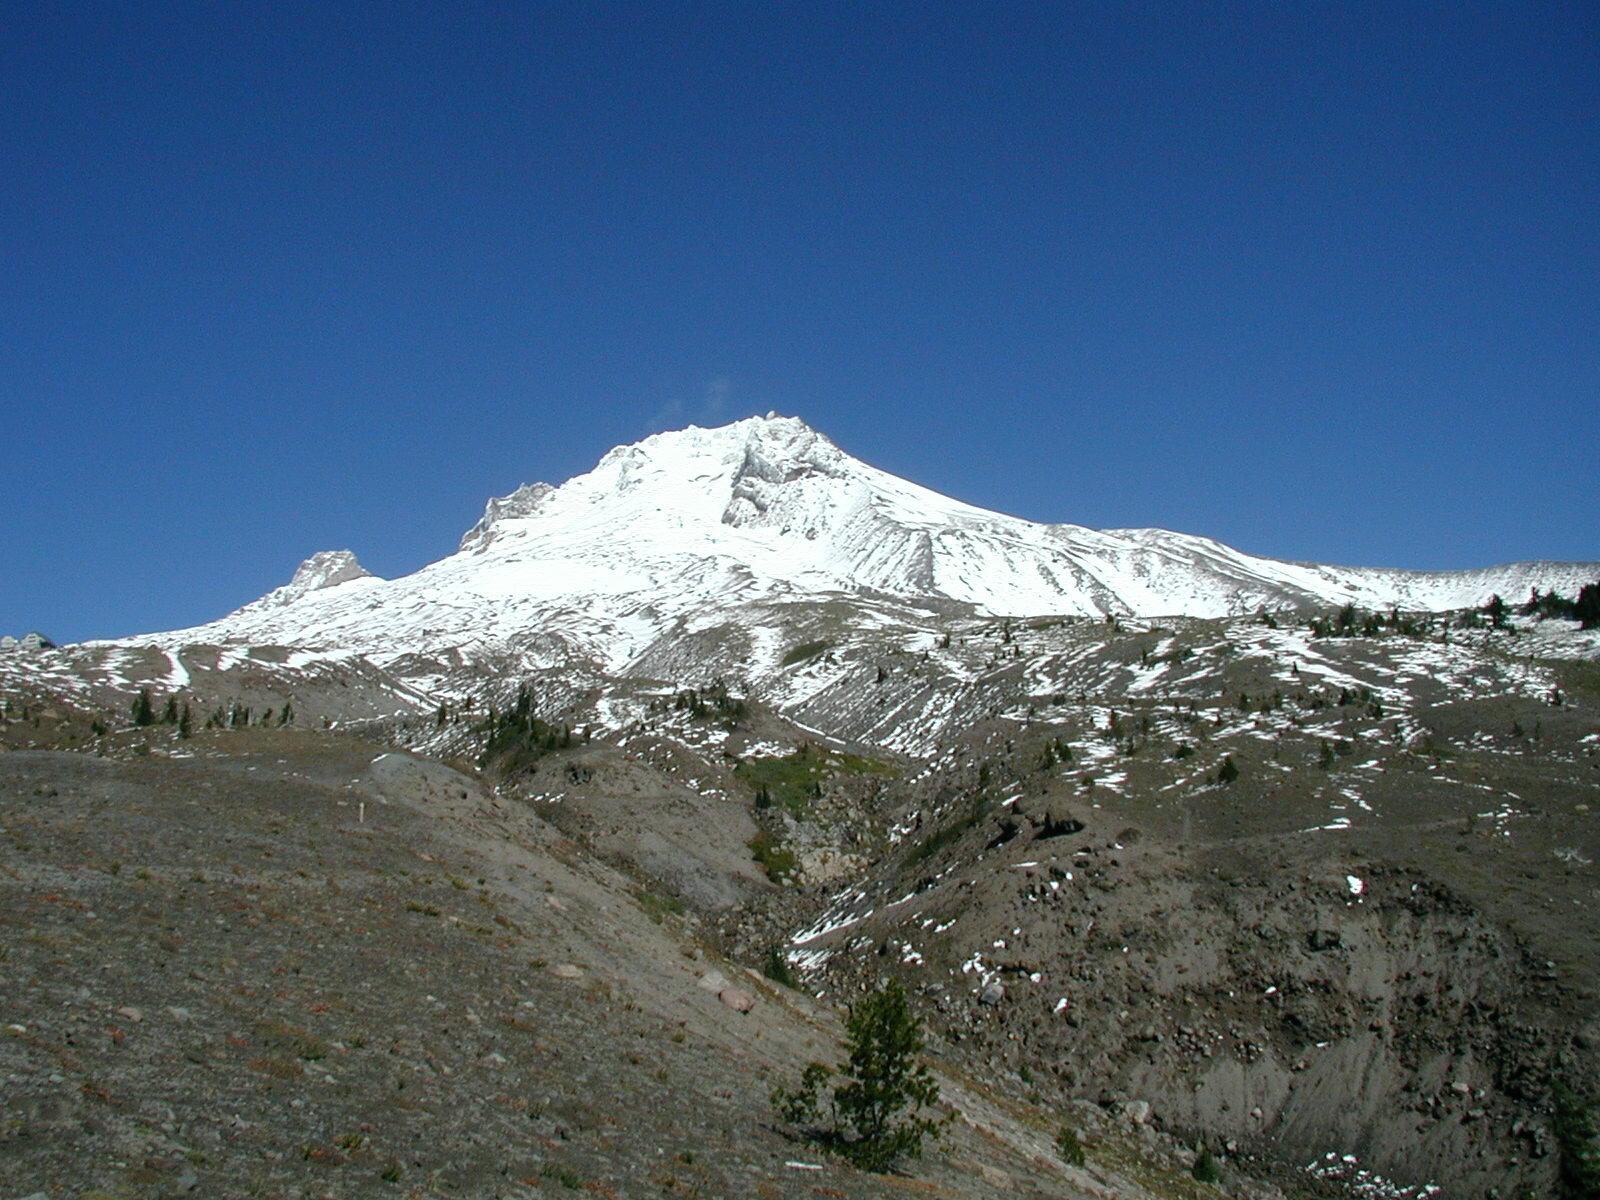 Scientists argue for more comprehensive studies of Cascade volcanoes